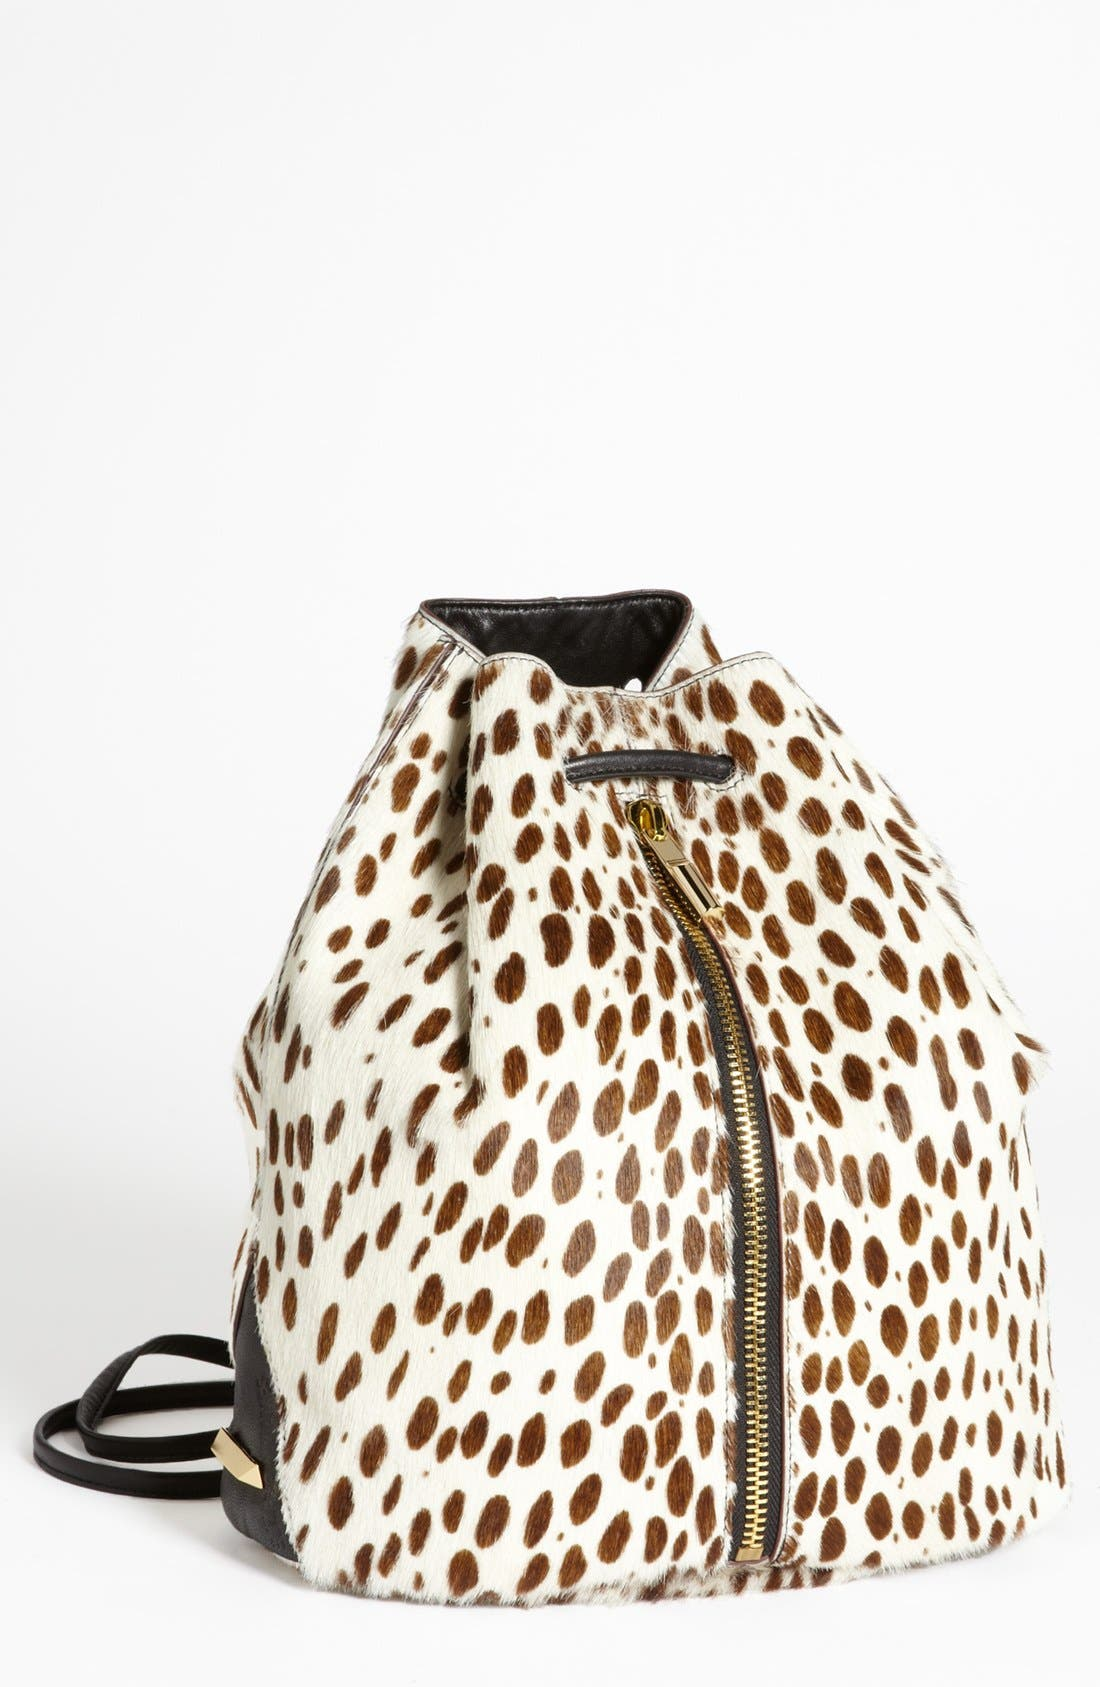 Alternate Image 1 Selected - Elizabeth and James Spotted Calf Hair Sling Backpack